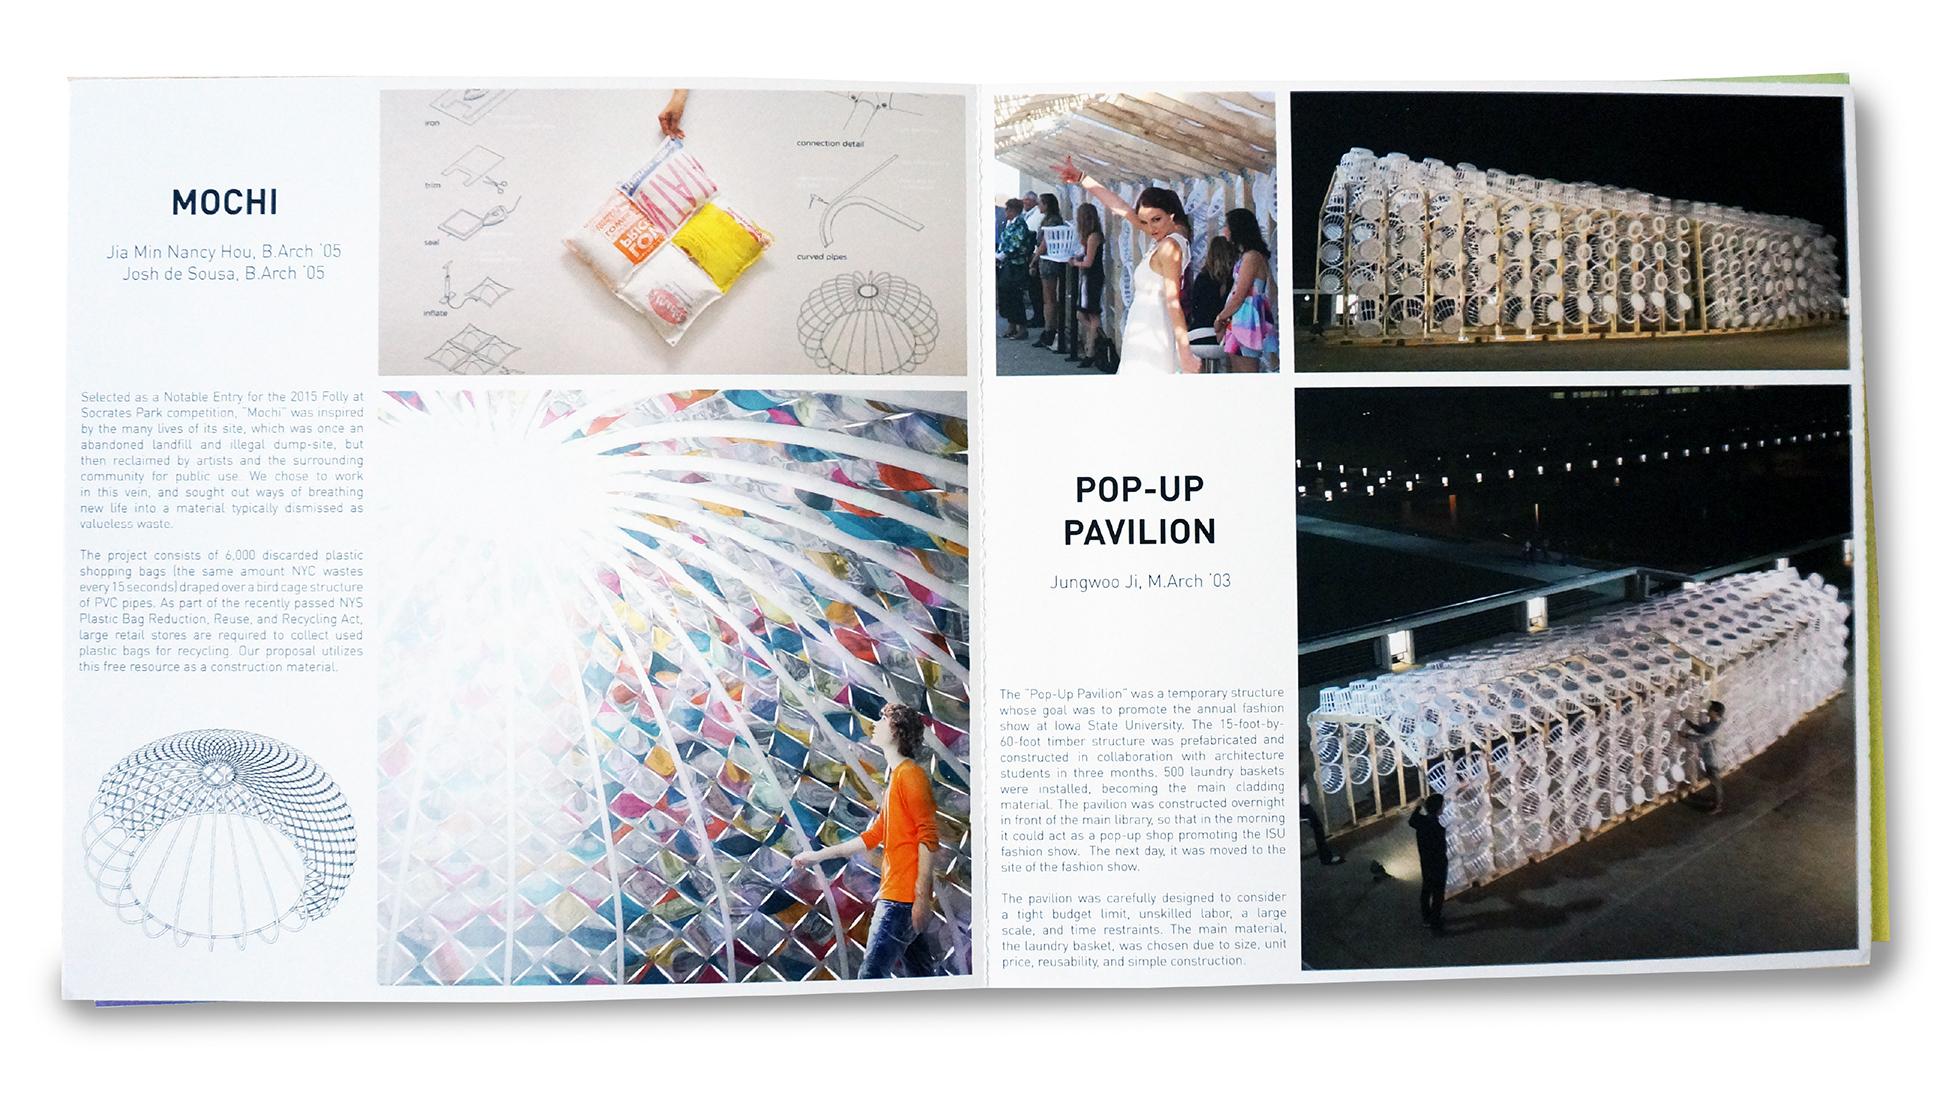 Pop-Up Pavilion - Jungwoo Ji - Association 8